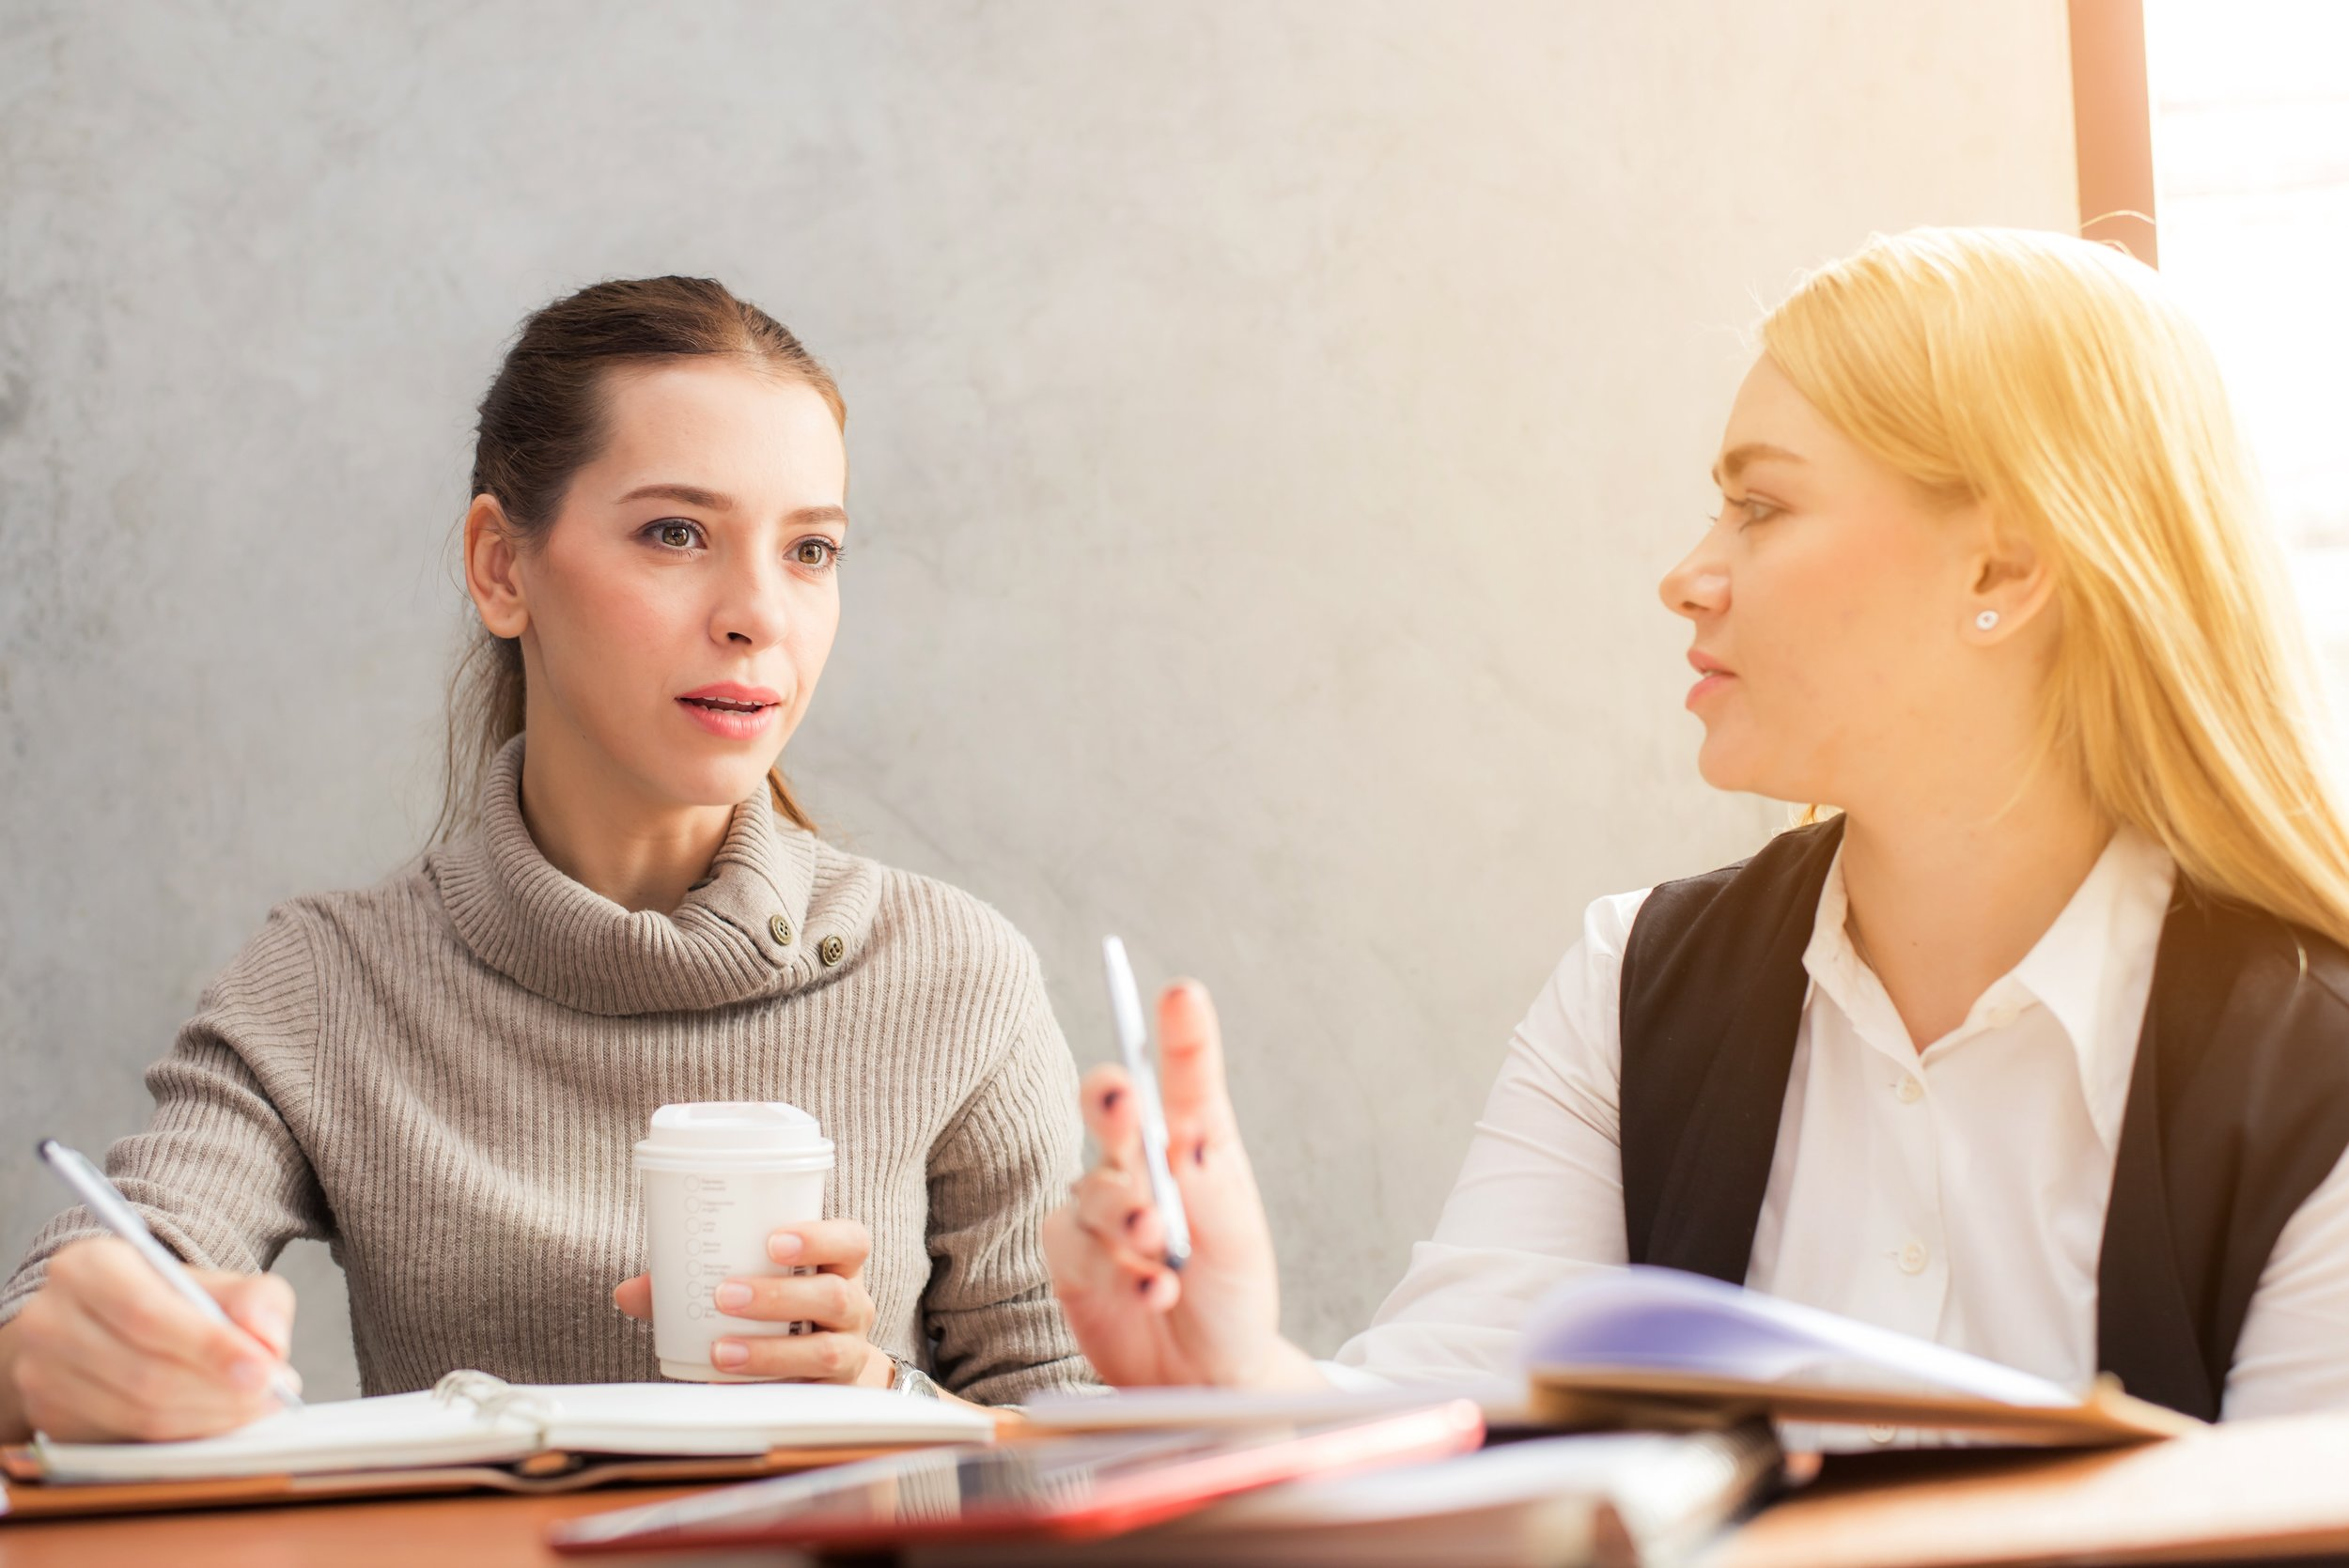 beautiful-brainstorming-businesswomen-601170.jpg